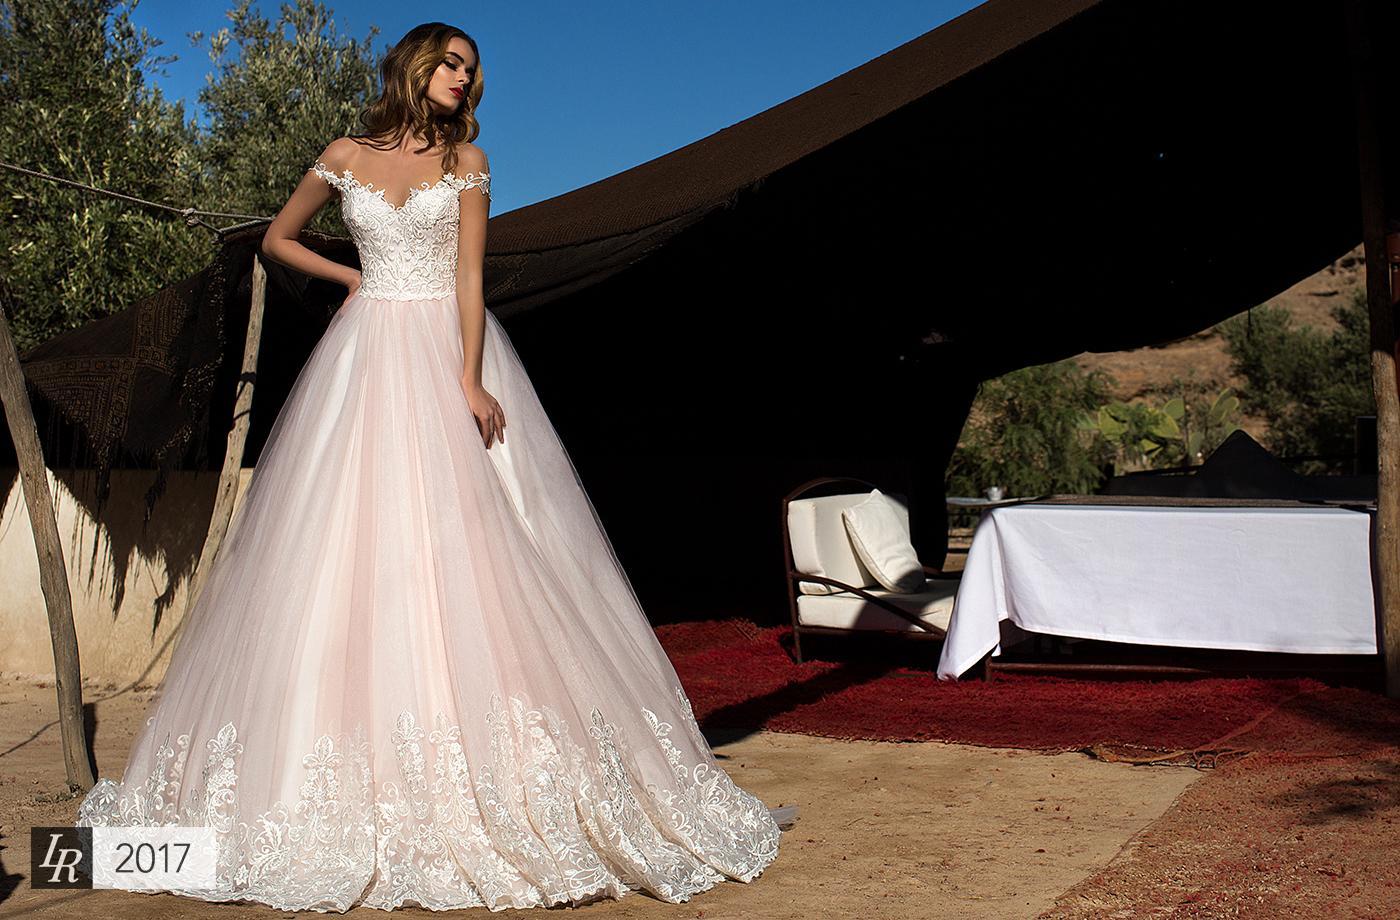 Svadobné šaty značky Lorenzo Rossi - Guvali - Obrázok č. 1